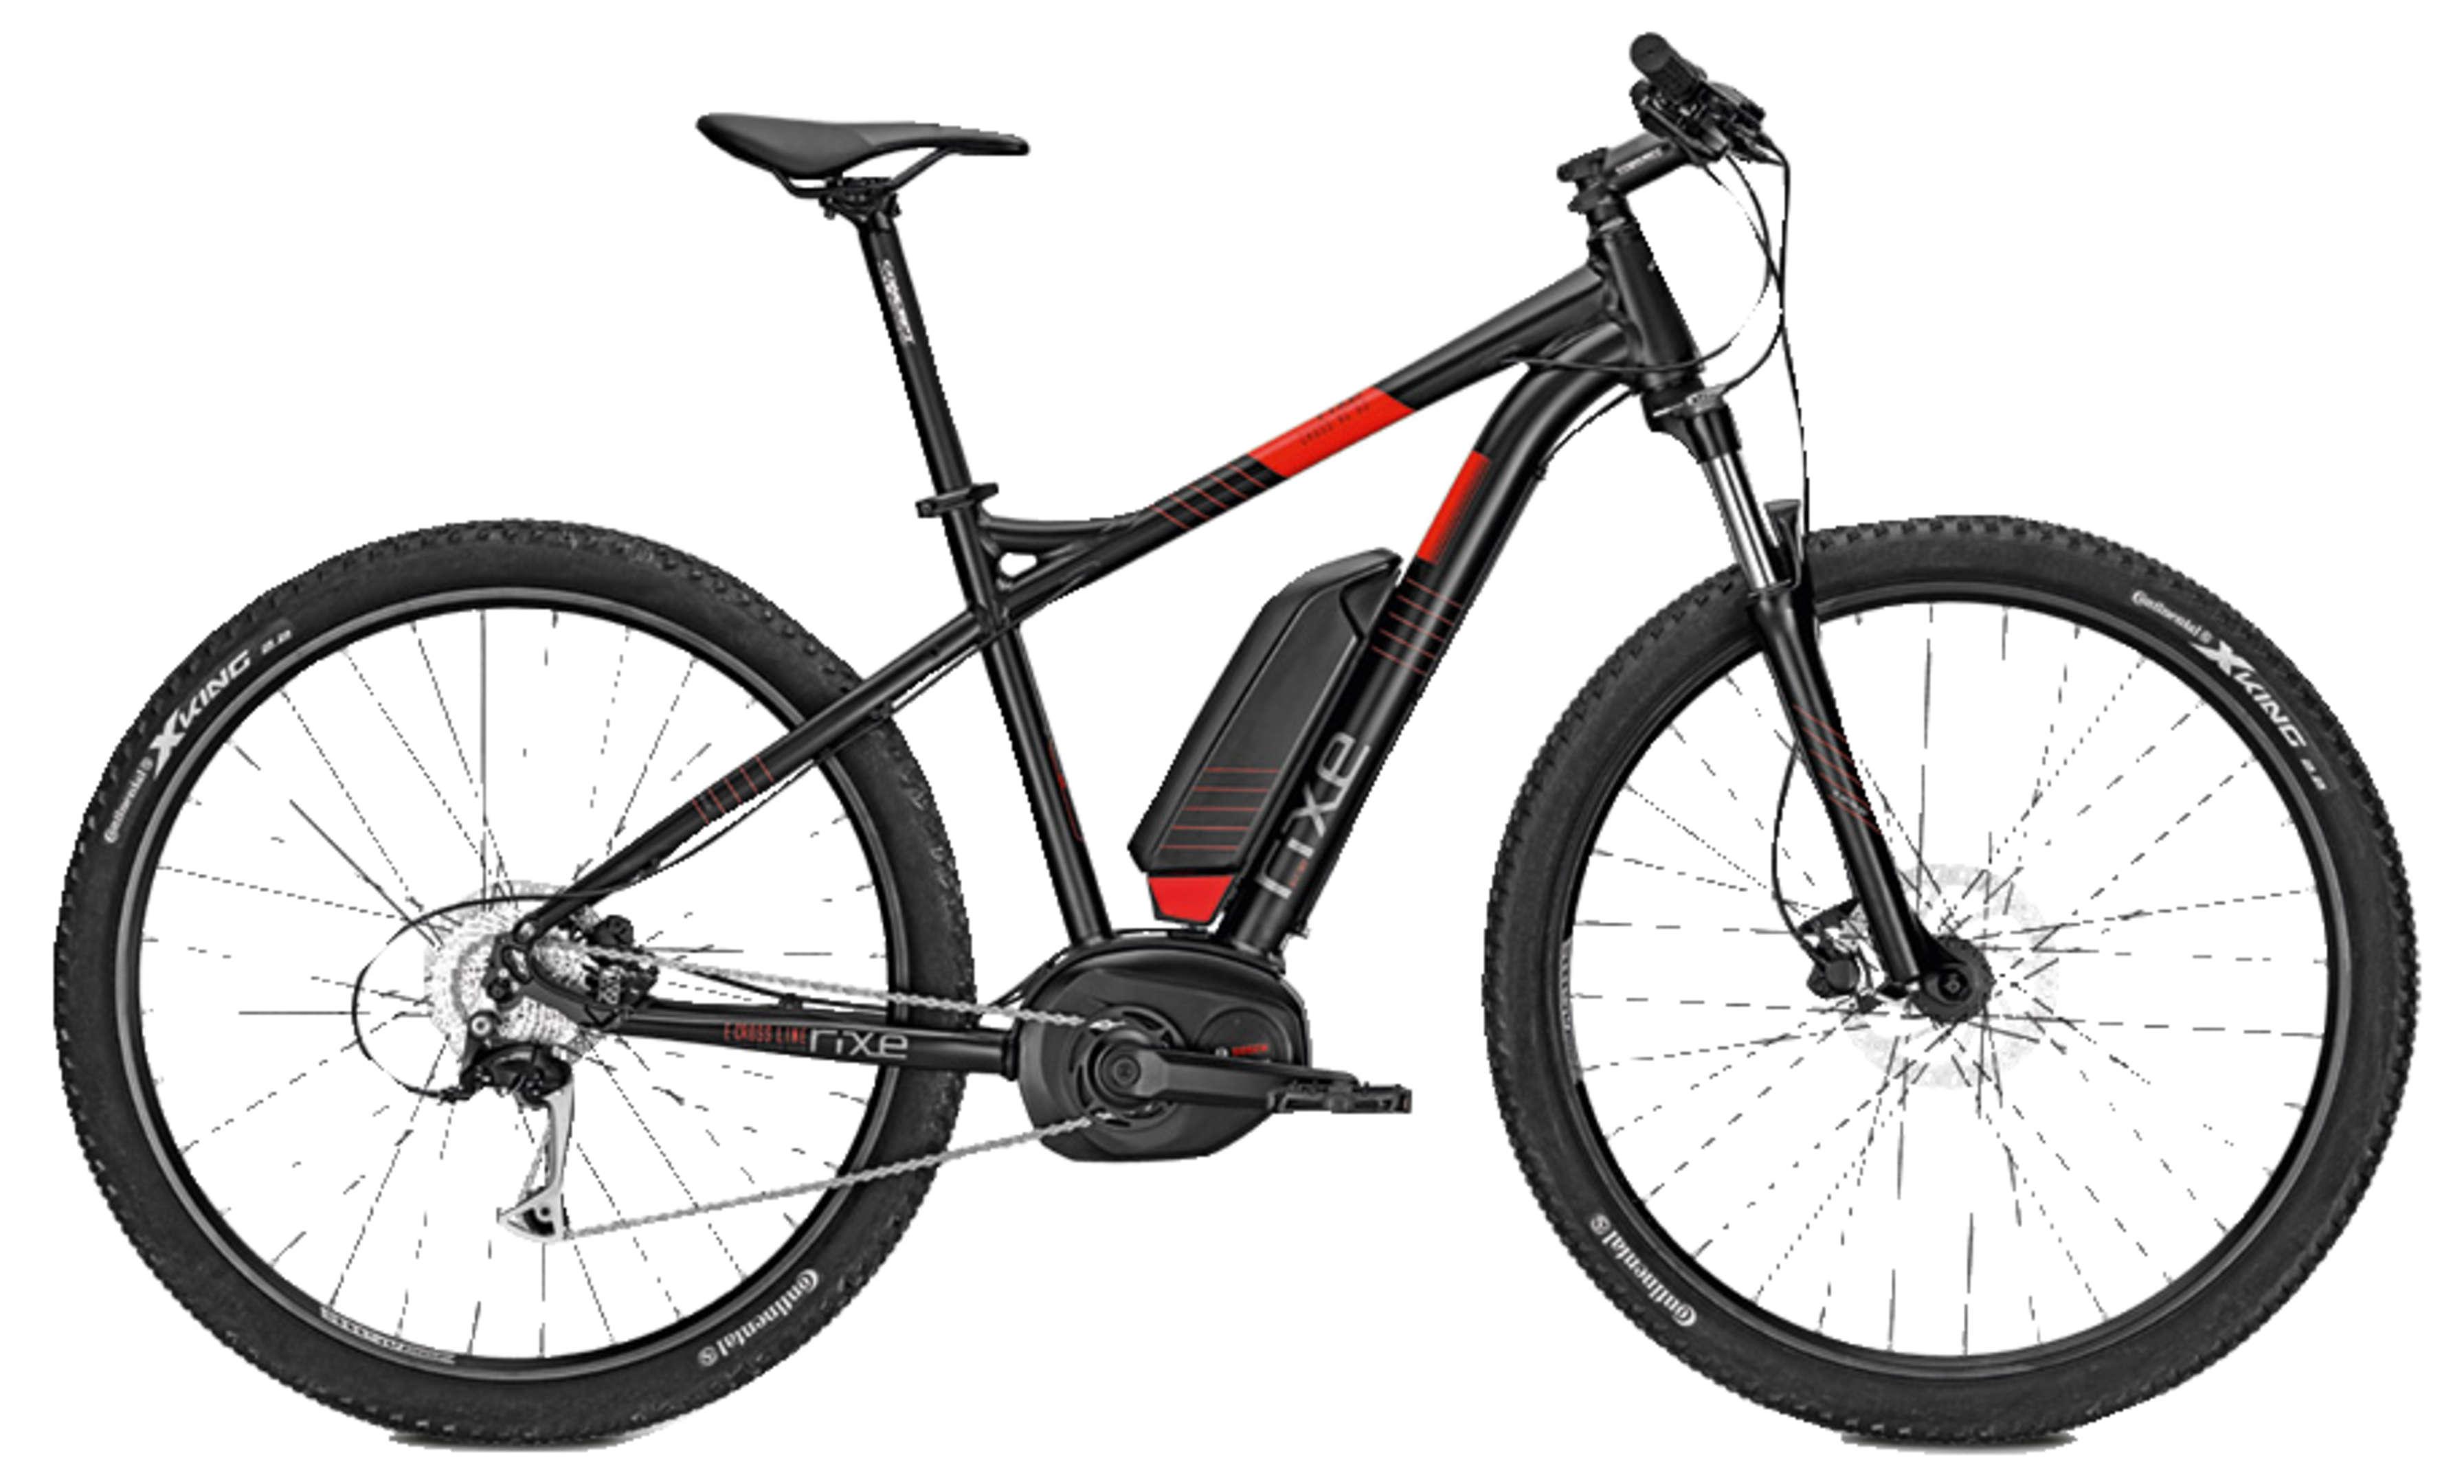 rixe e bike cross xc b9 9g 11 1ah 36v eurorad. Black Bedroom Furniture Sets. Home Design Ideas